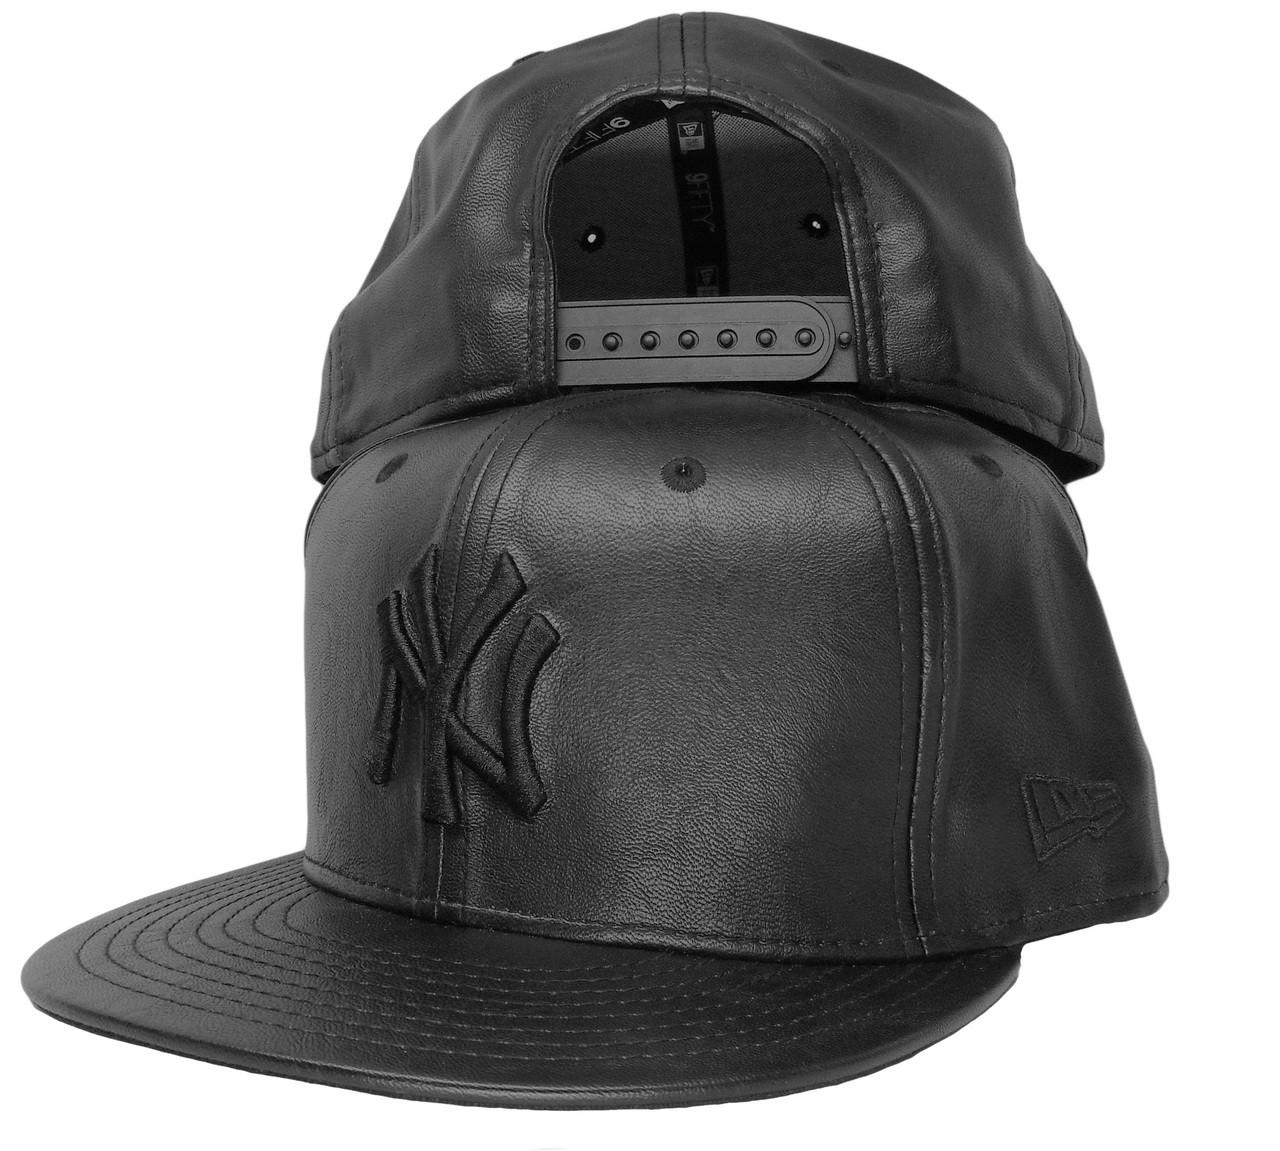 f26b372943d New York Yankees Custom All Leather Snapback - All Black ...